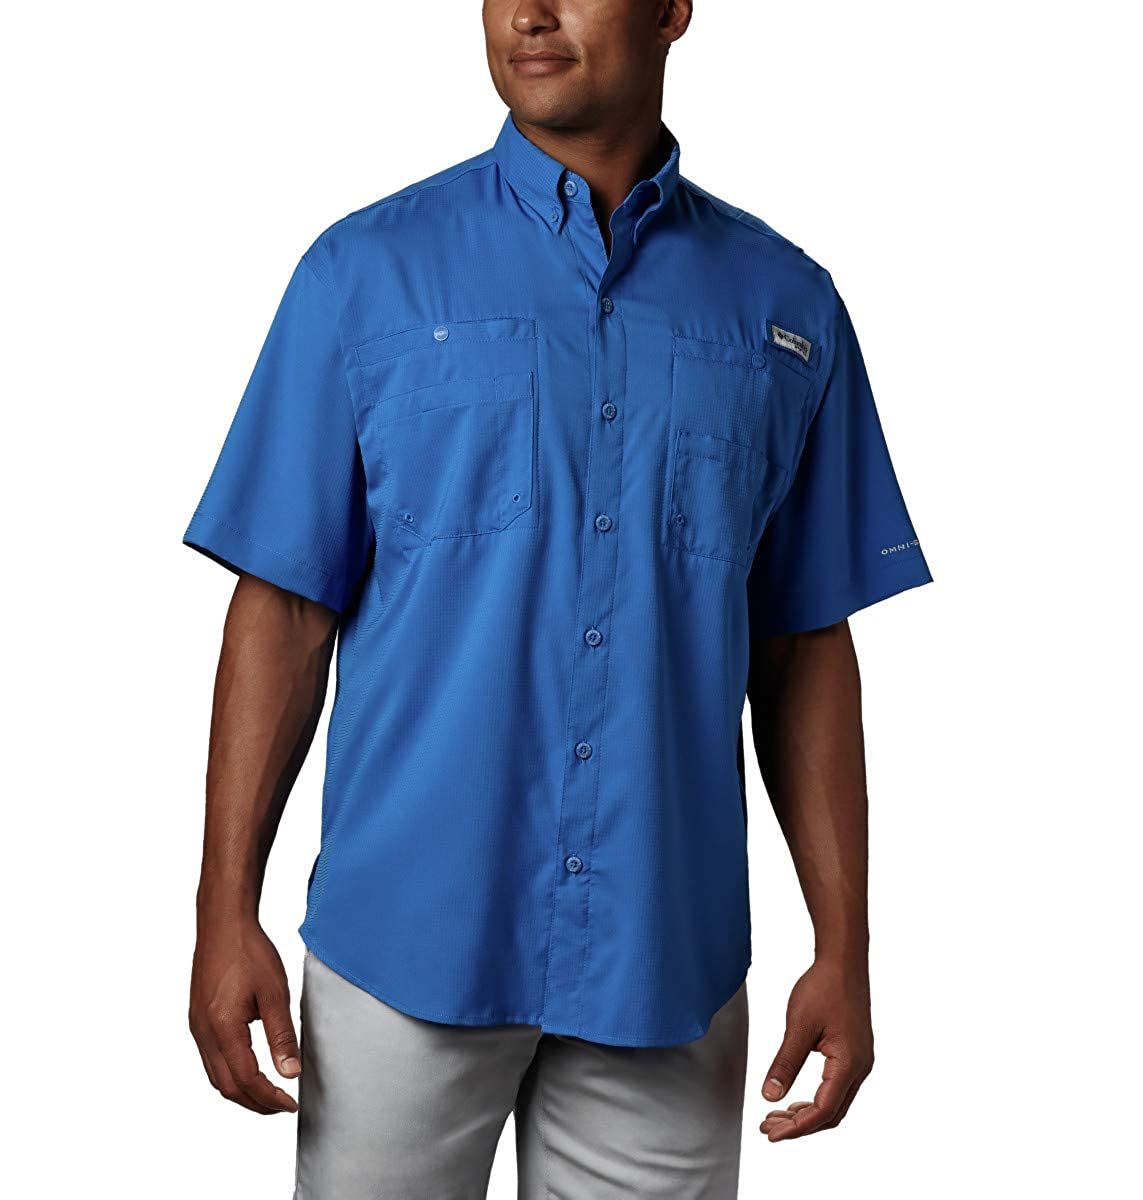 Columbia Men's PFG Tamiami II Short Sleeve Shirt, UPF 40 Sun Protection, Wicking Fabric